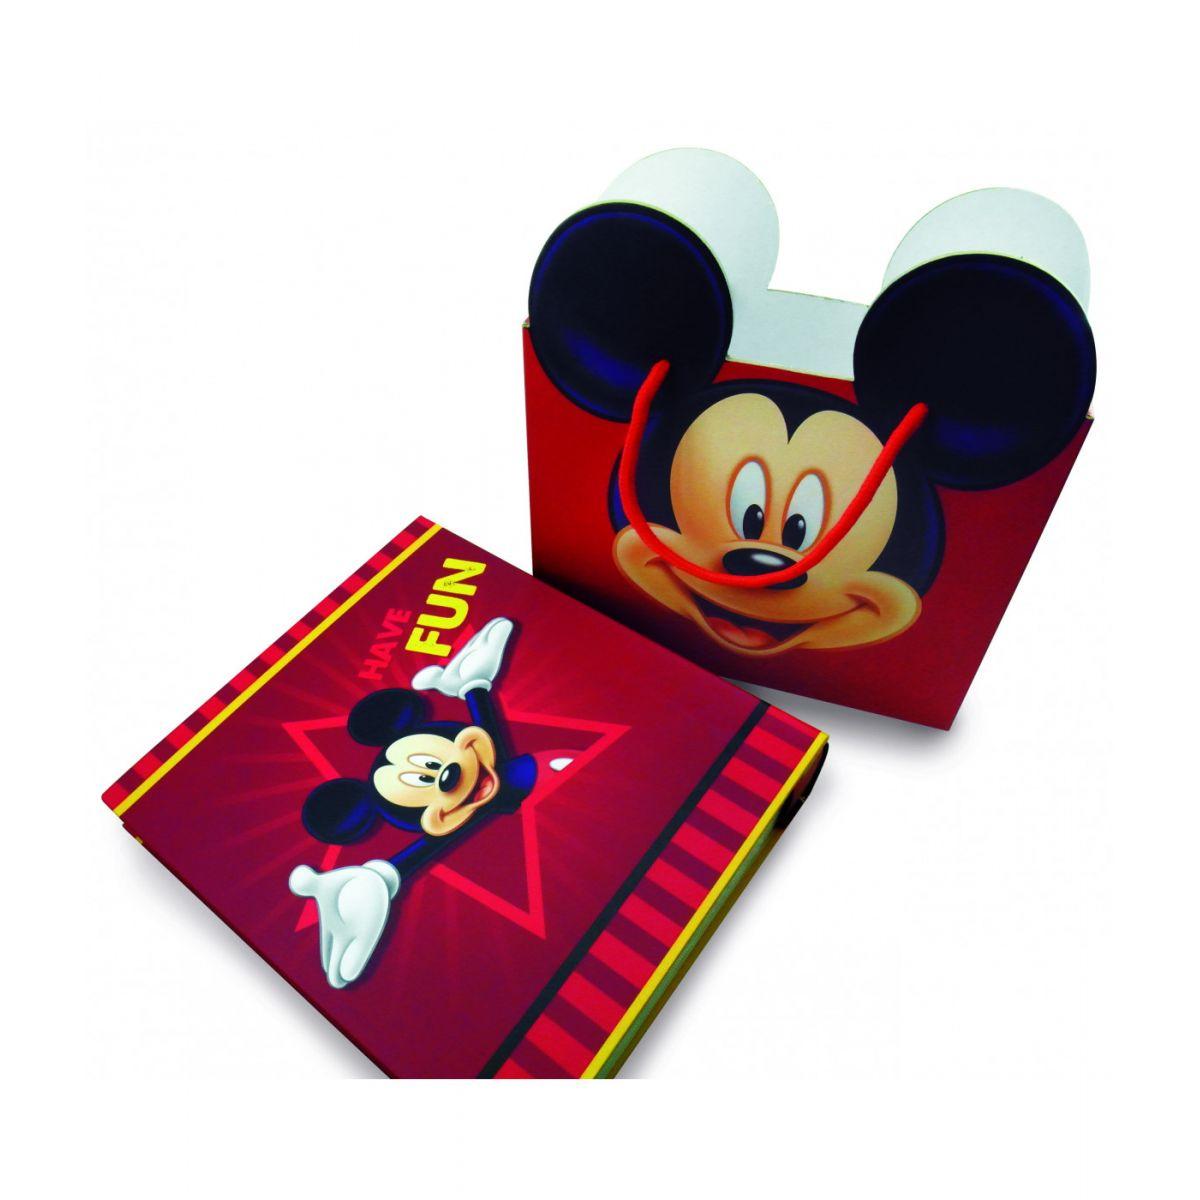 Álbum de Fotos Mickey Mouse - Disney